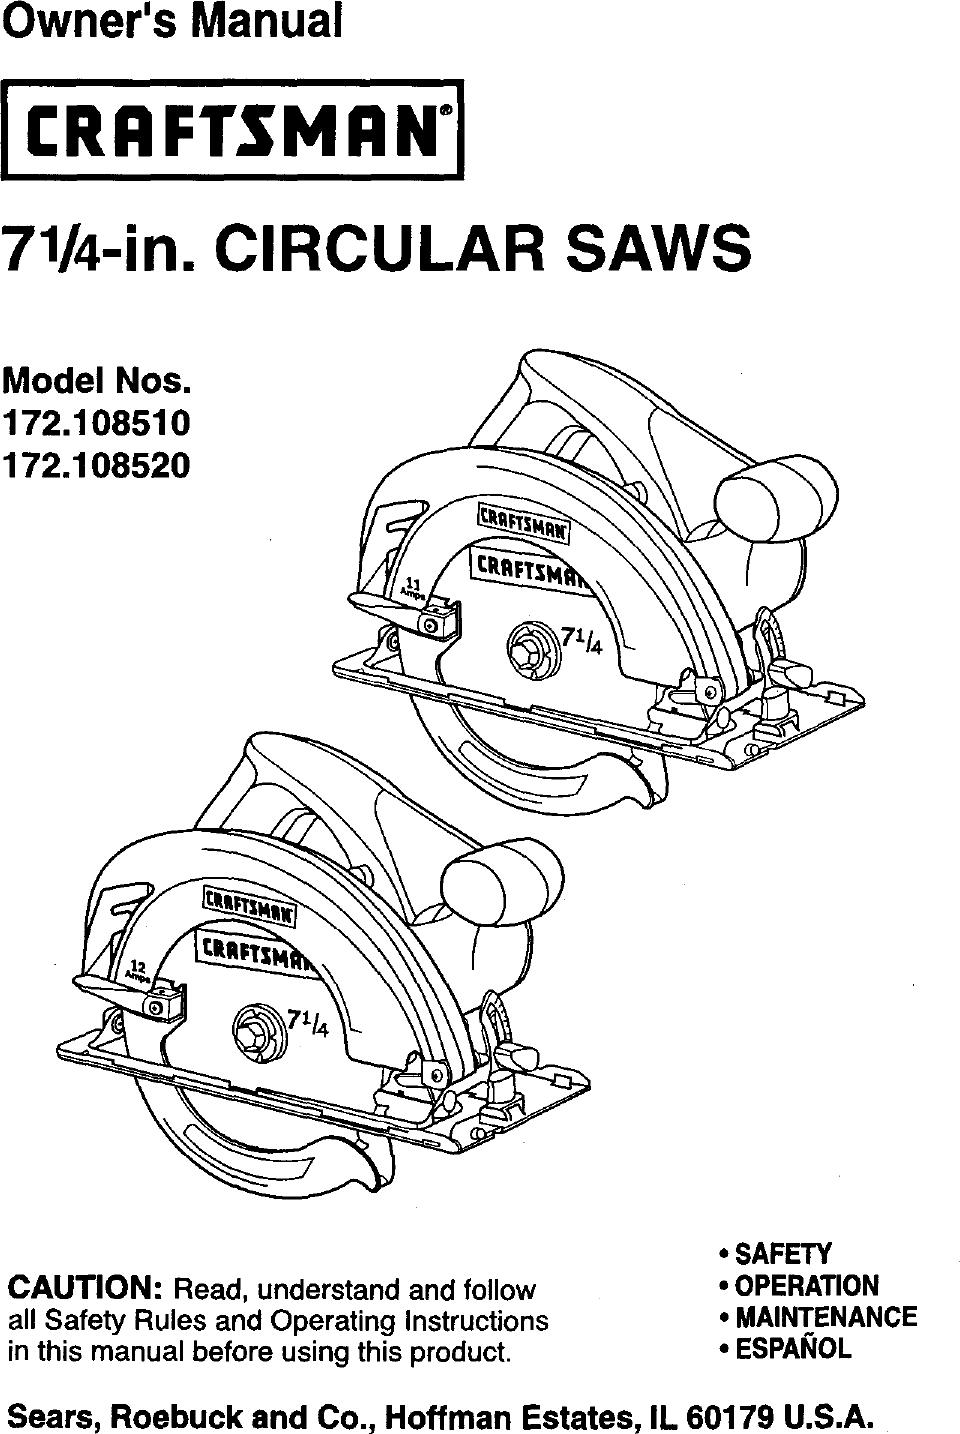 Craftsman 172108510 User Manual CIRCULAR SAW Manuals And